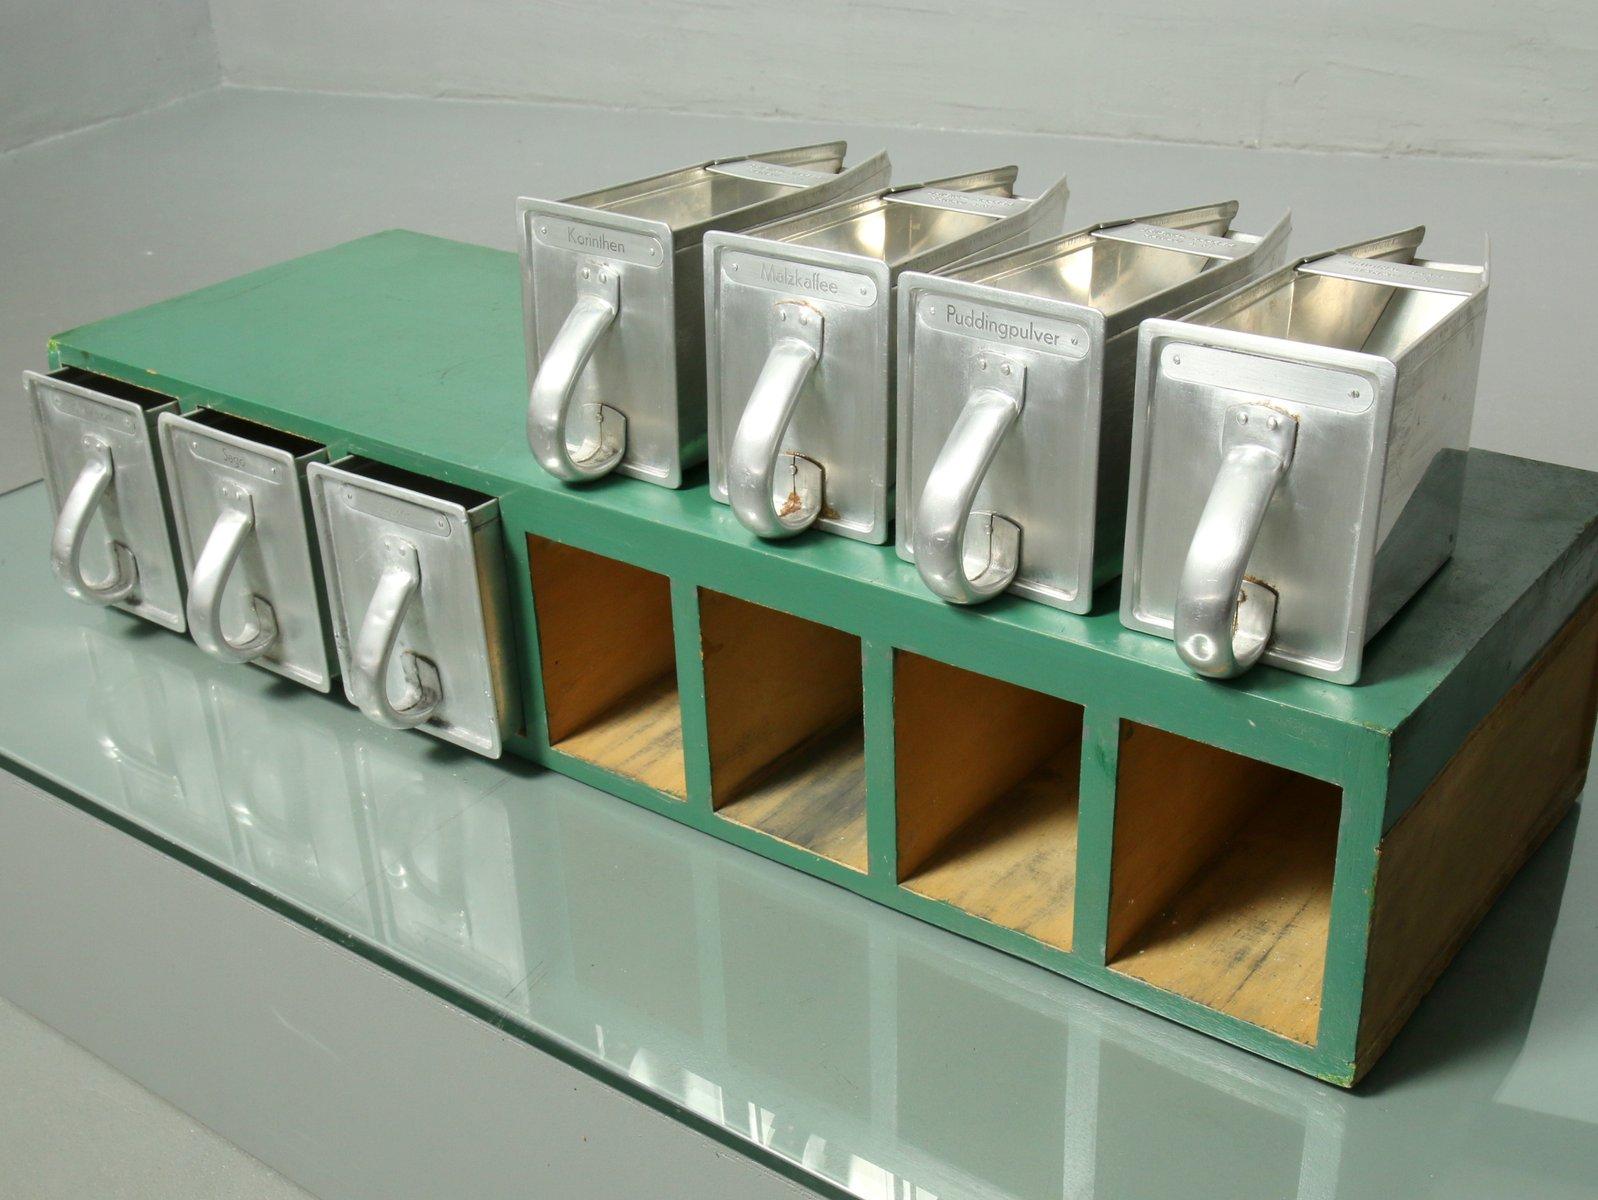 Mobile storage da cucina frankfurt di margarete sch tte lihotzky anni 39 50 in vendita su pamono - Mobile cucina anni 50 ...